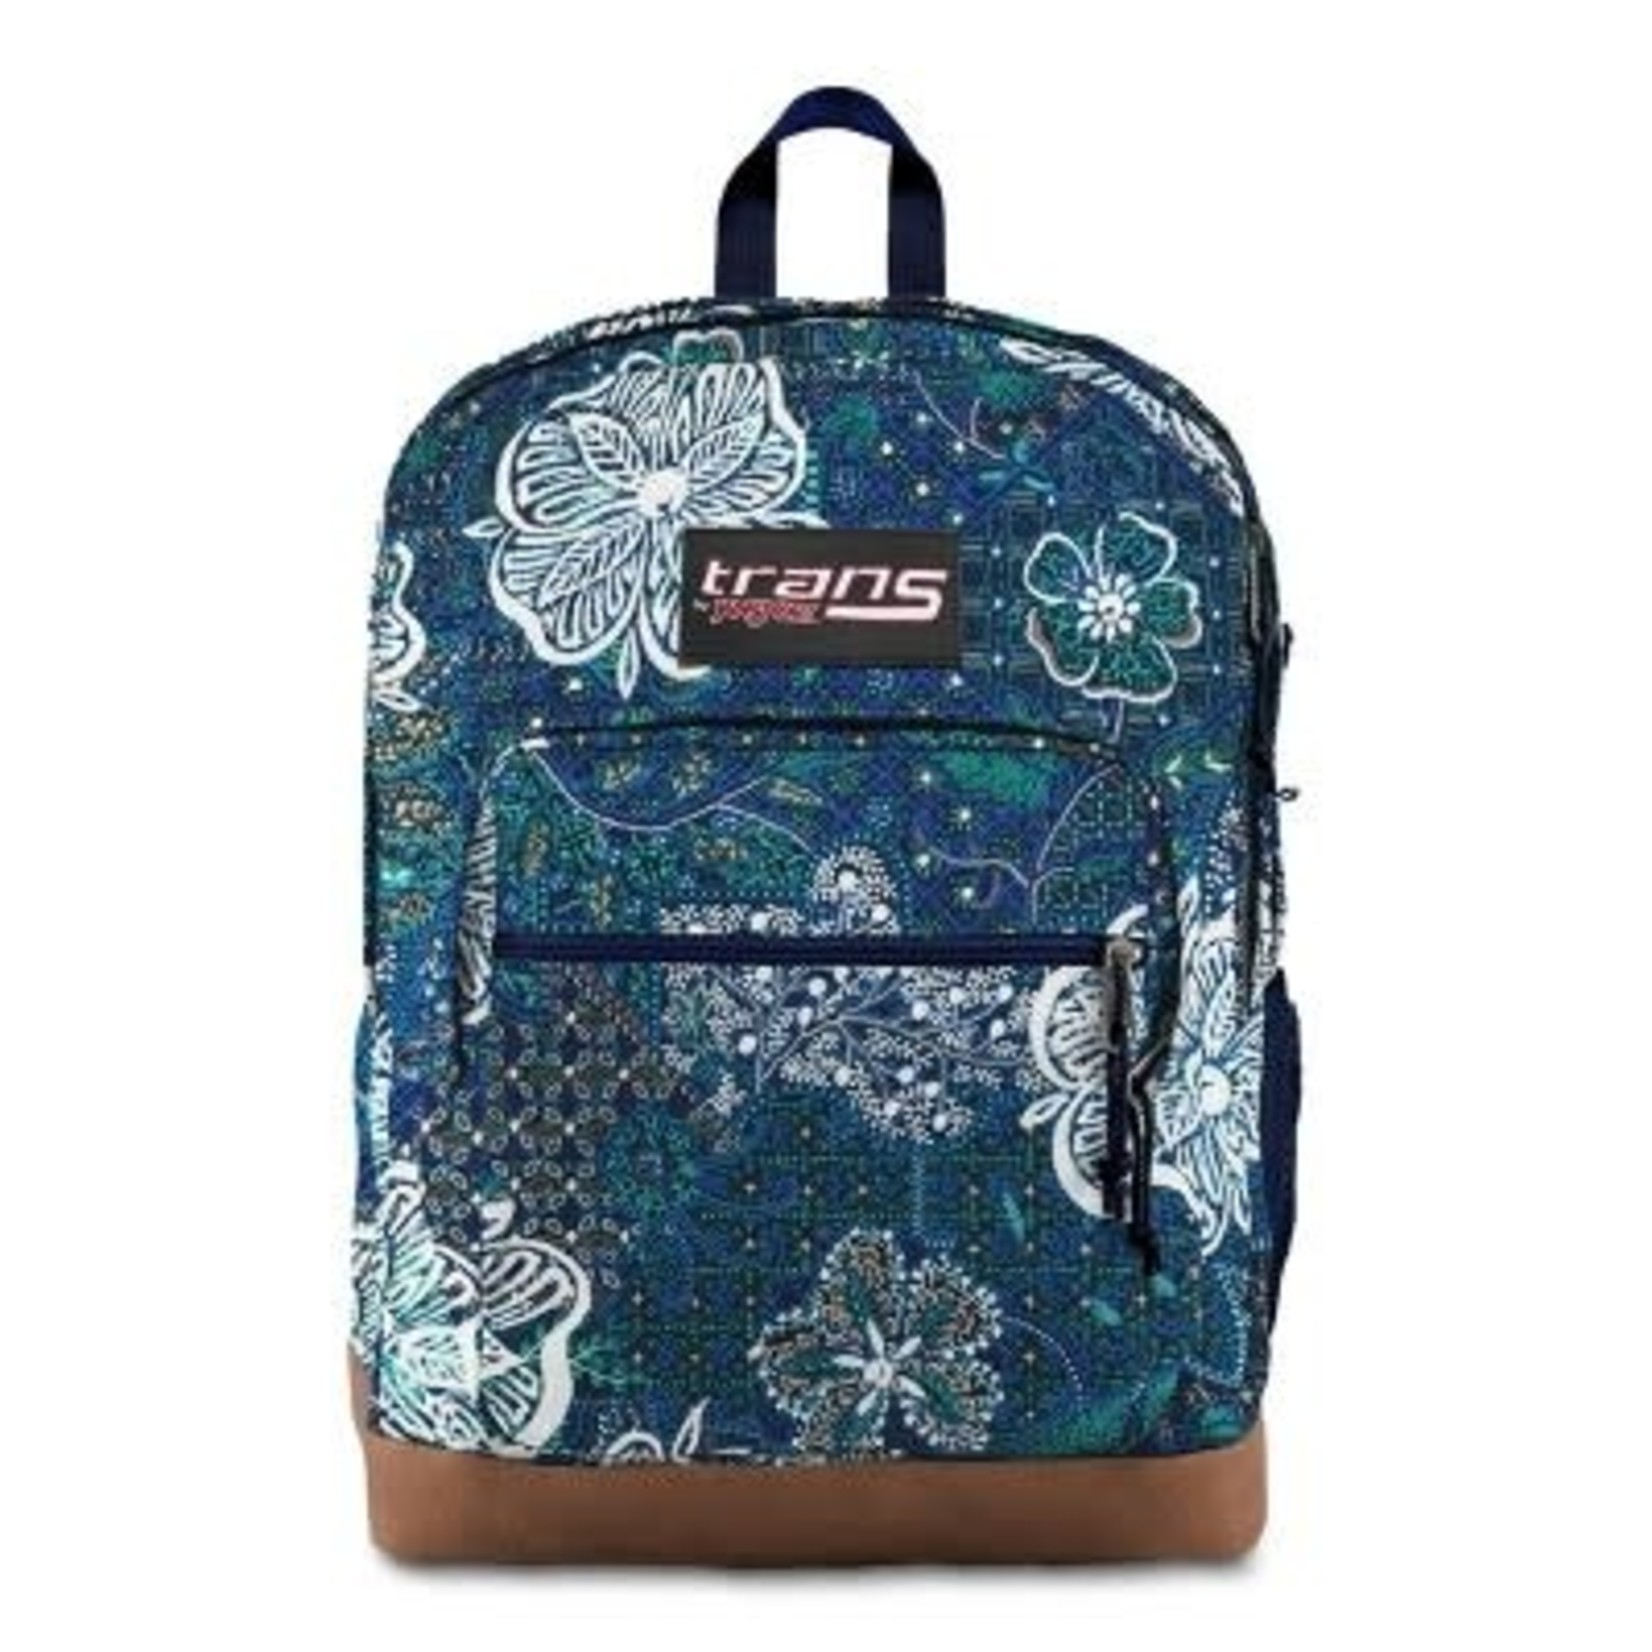 "Trans by JanSport 17"" Super Cool Backpack - Mosaic Garden Blue"